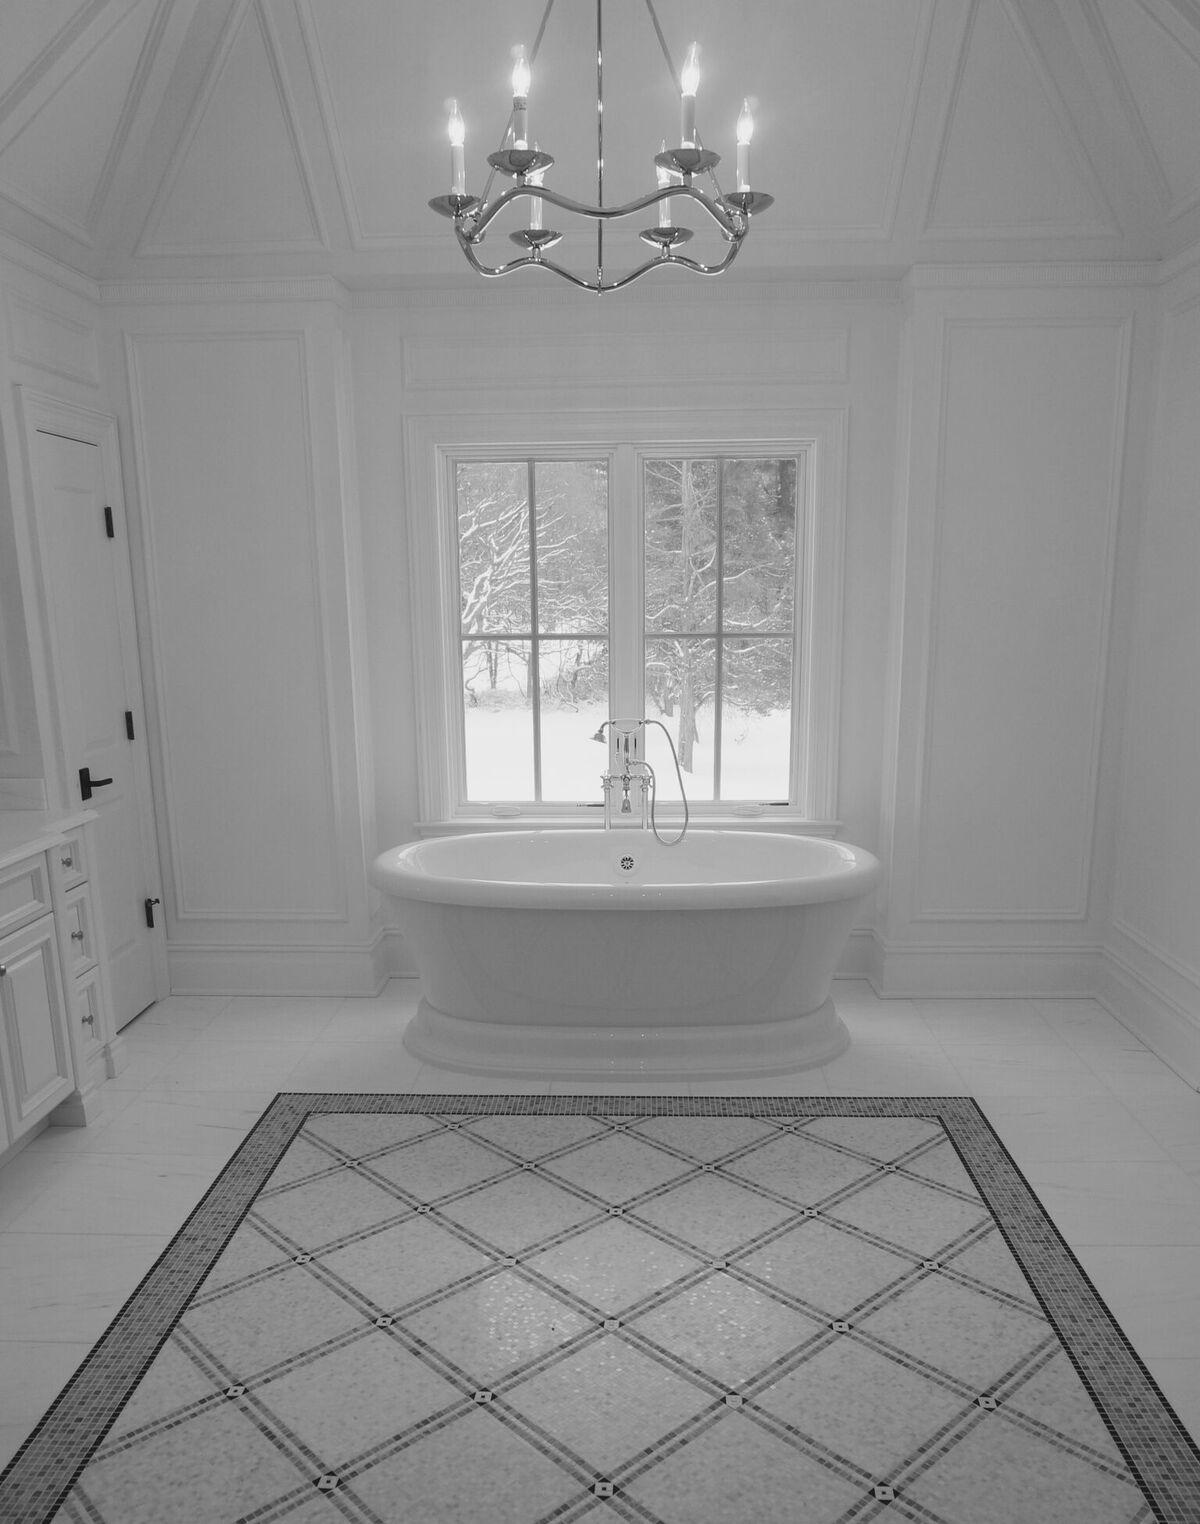 Bathroom Fixtures Melville, Woodbury & Syosset, NY